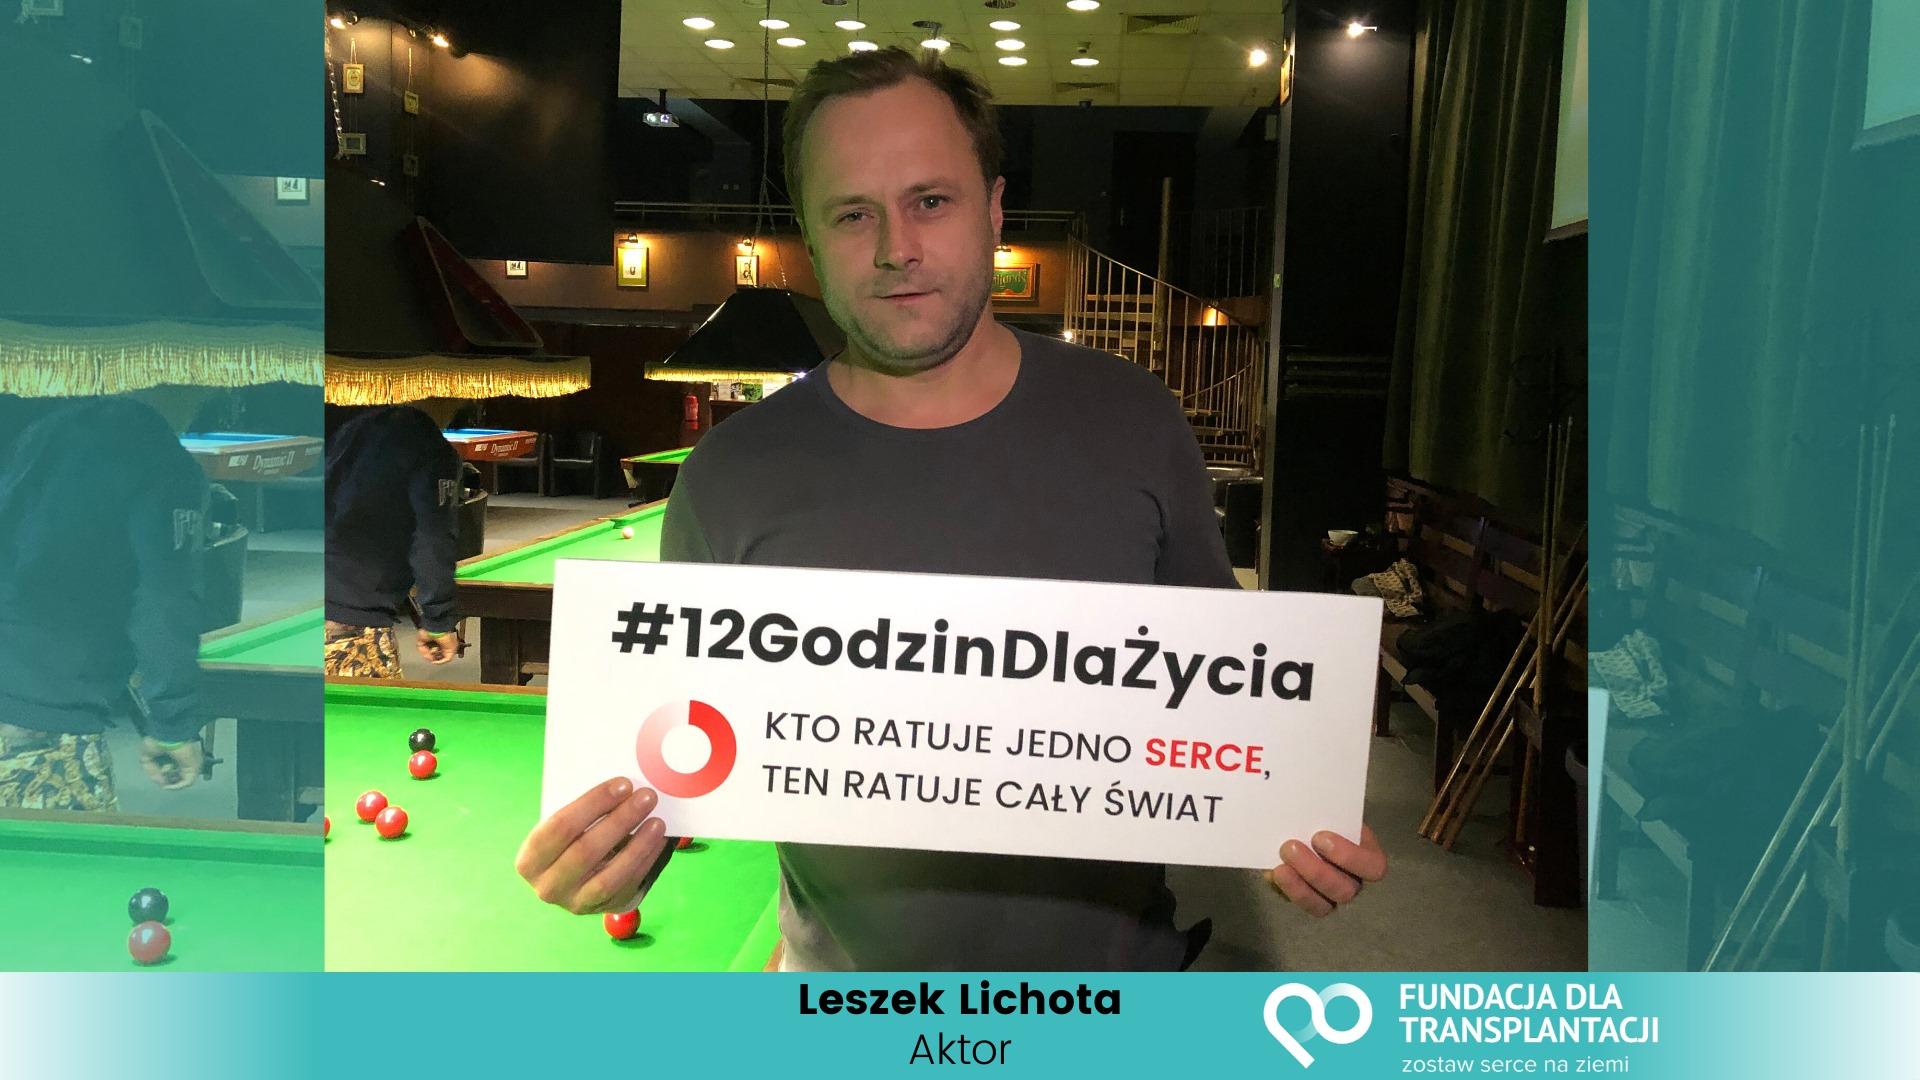 Leszek Lichota